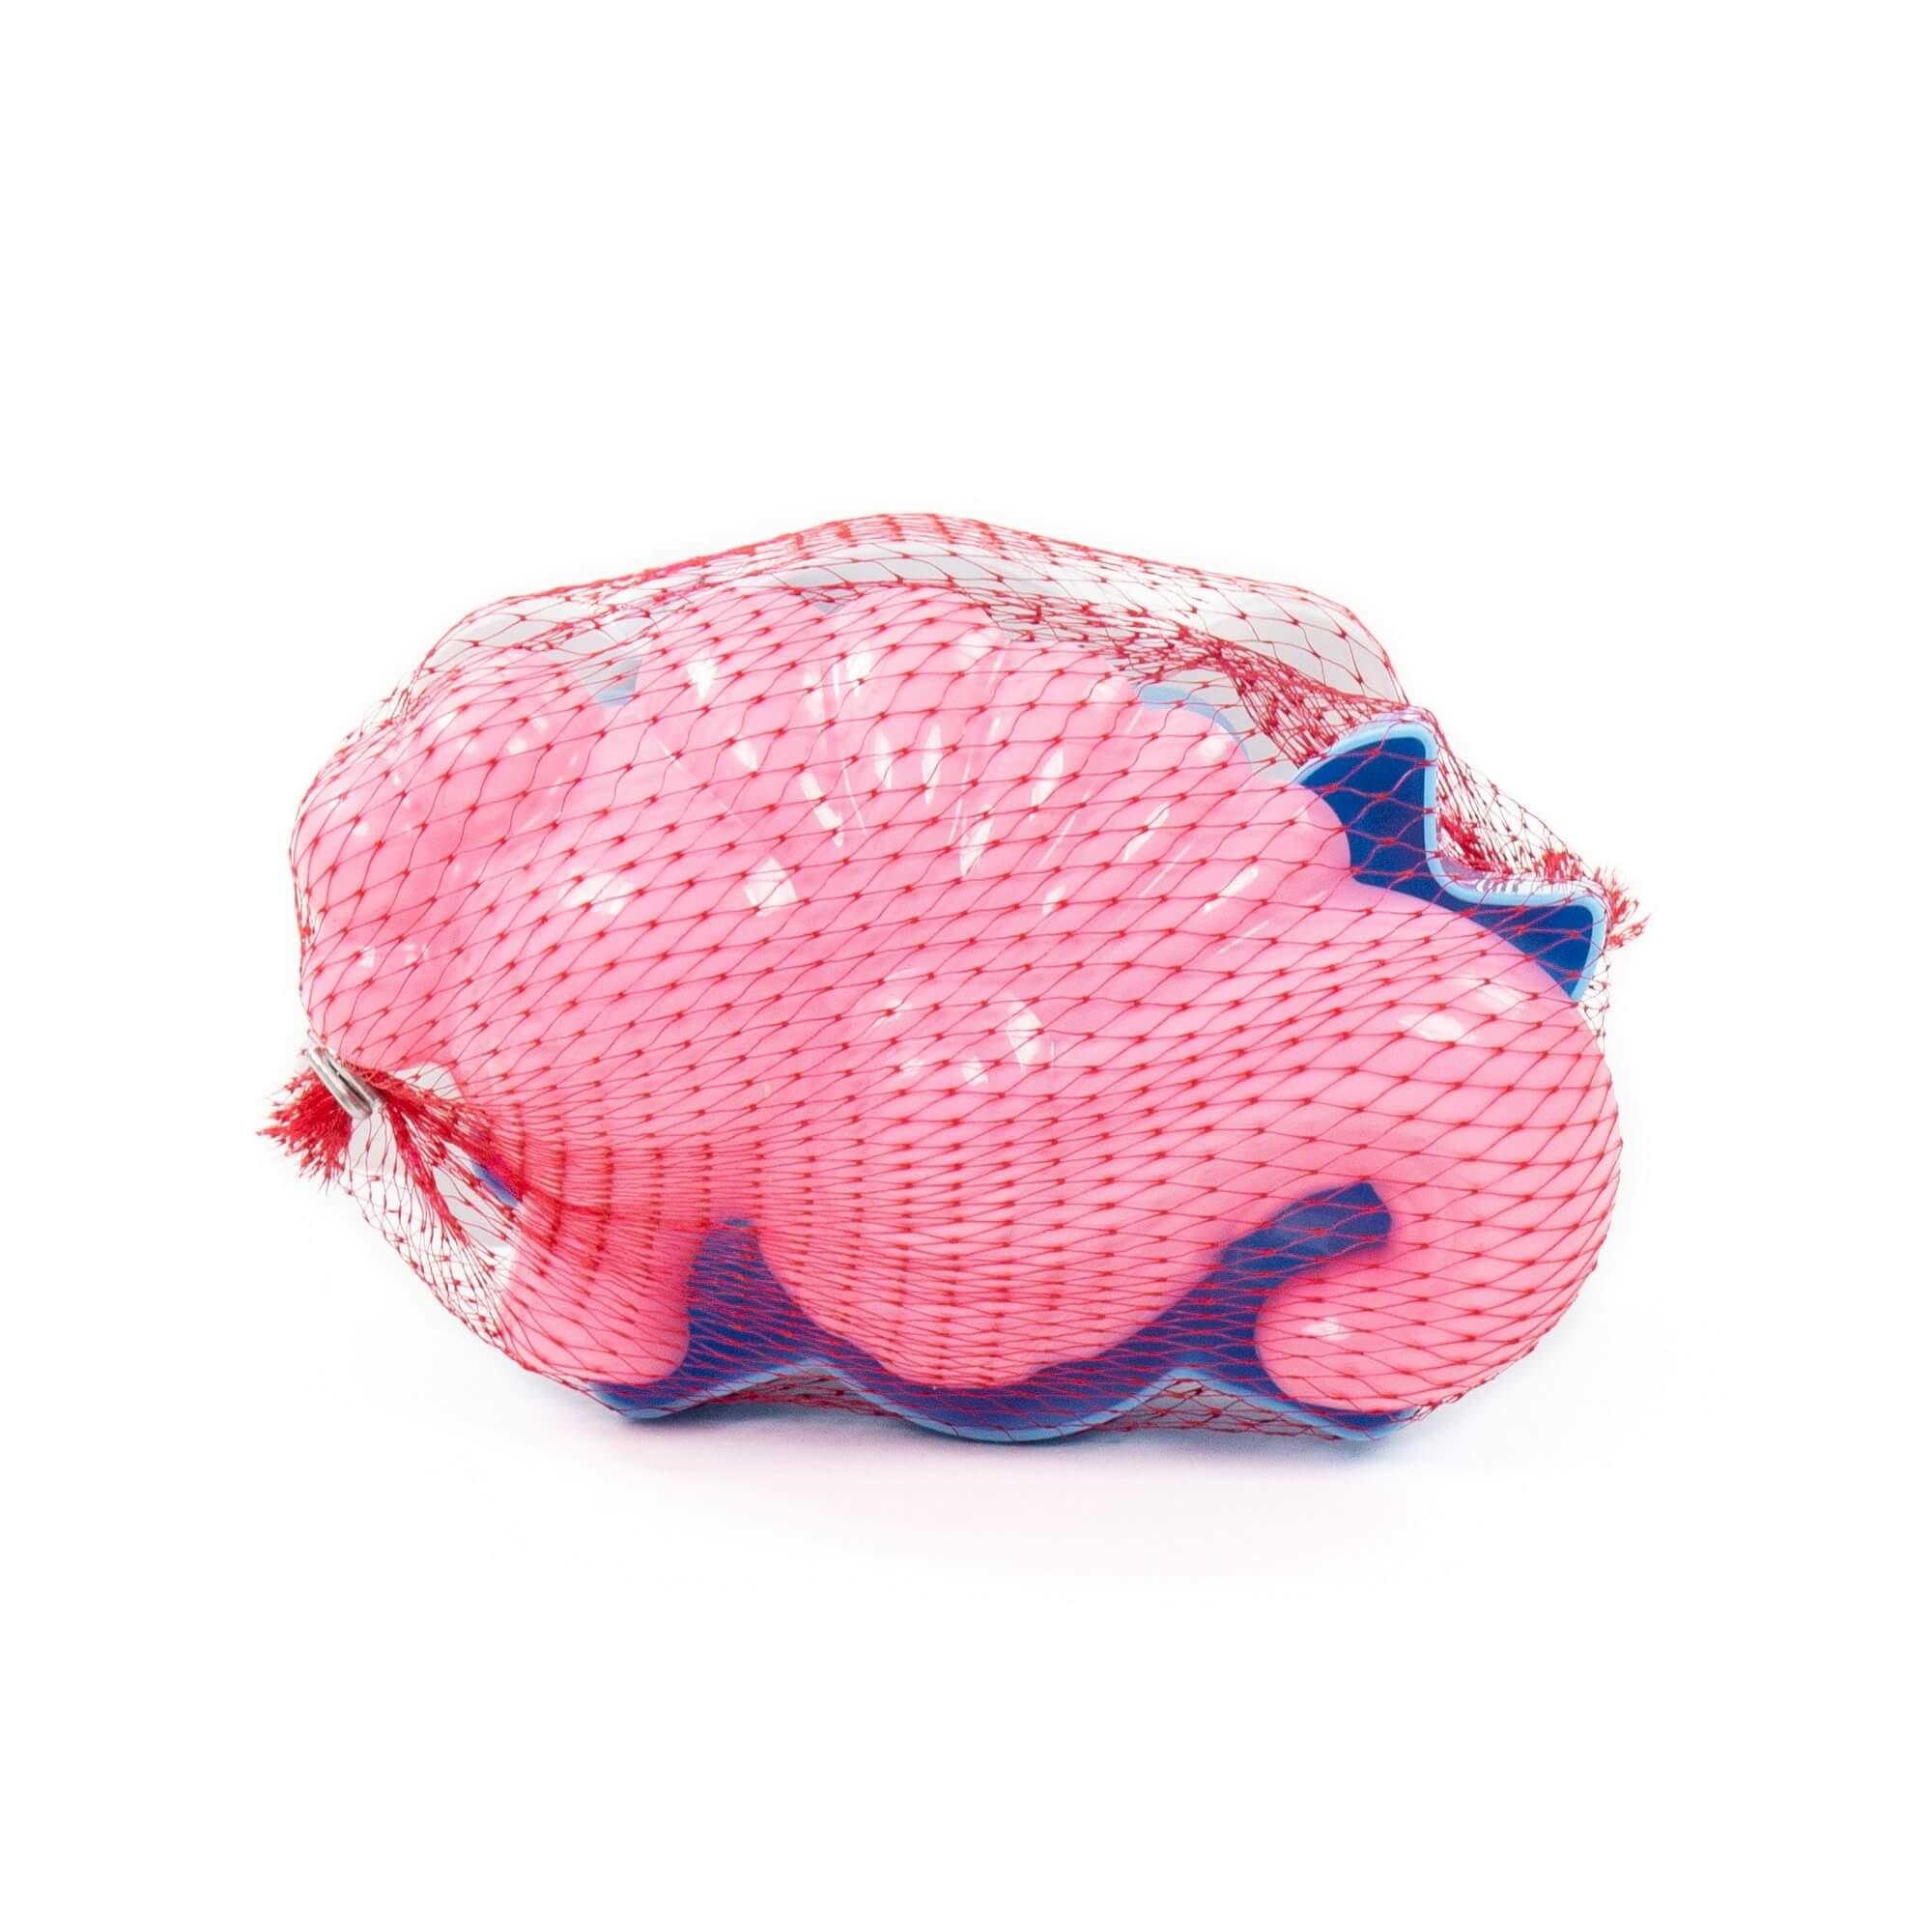 Foremki - krab, konik morski, muszla (36551)